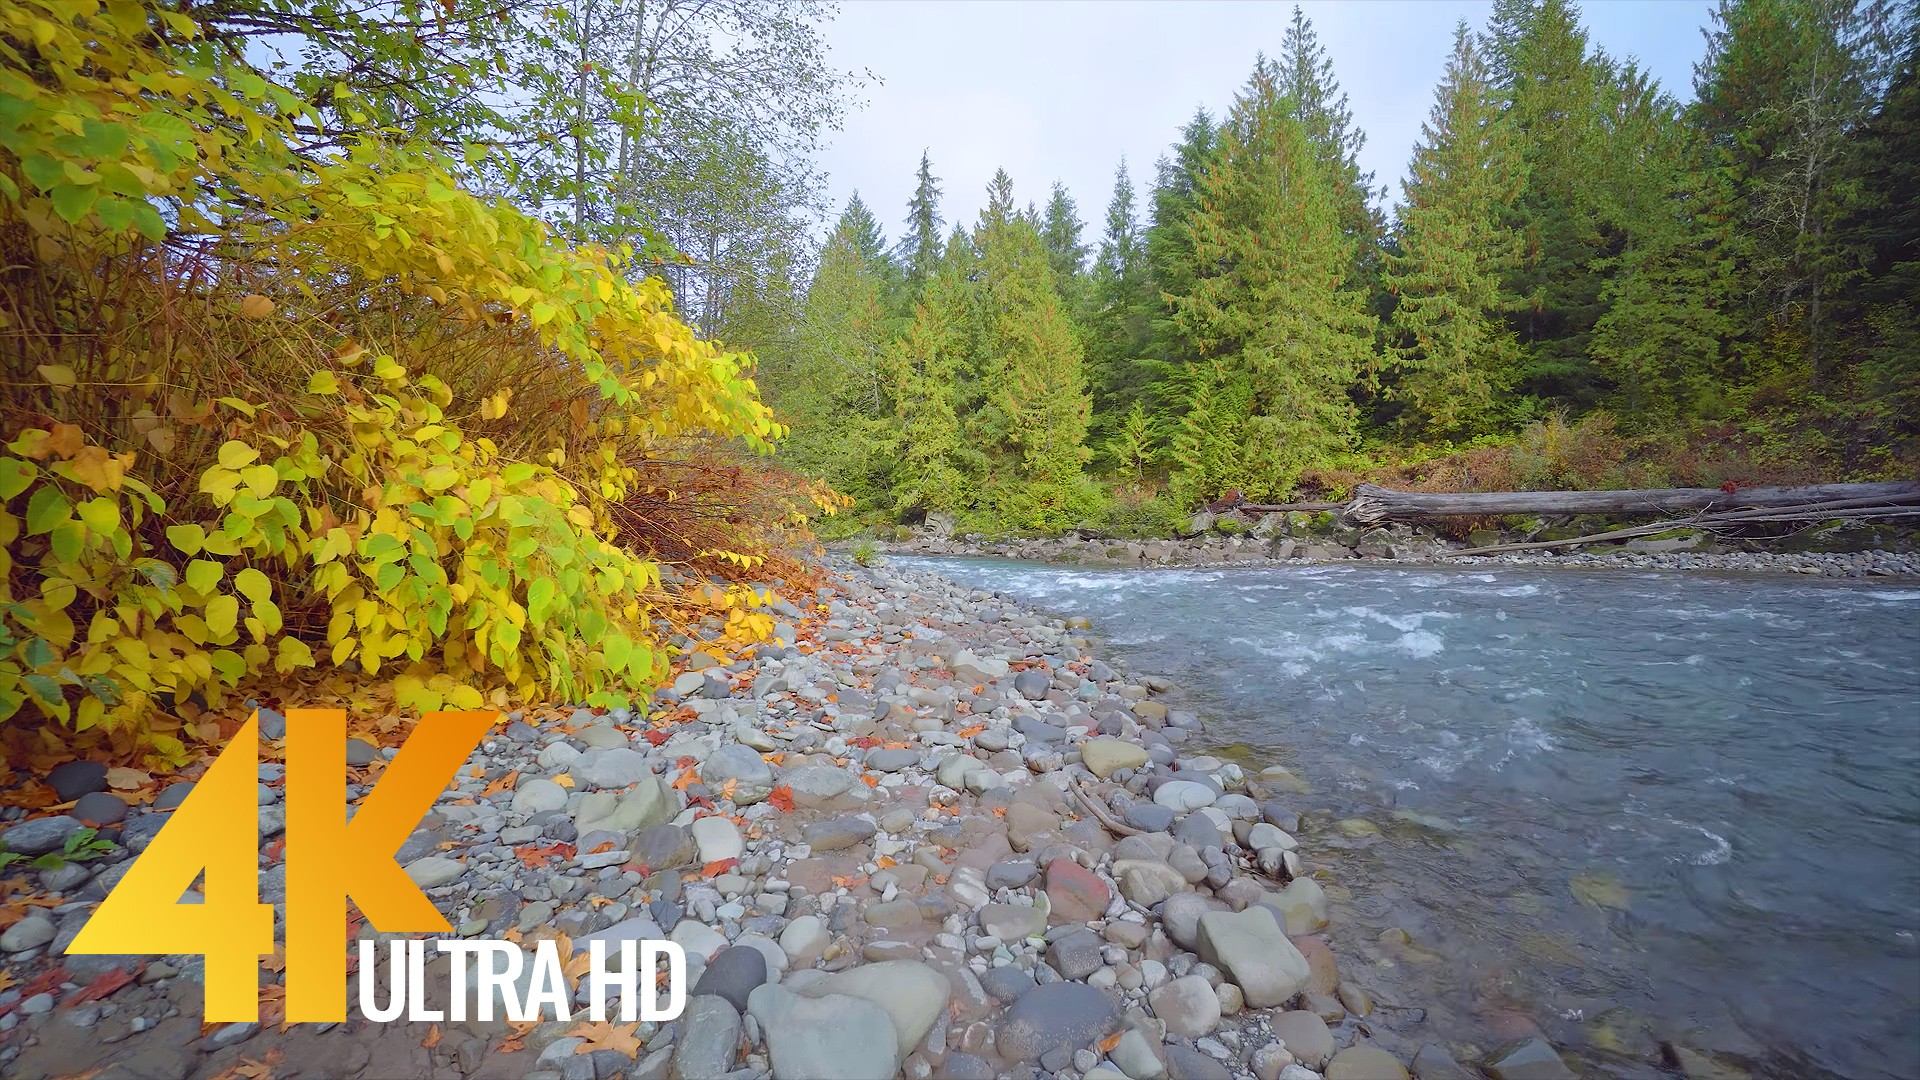 Nooksack River, Mount Baker area, Washington